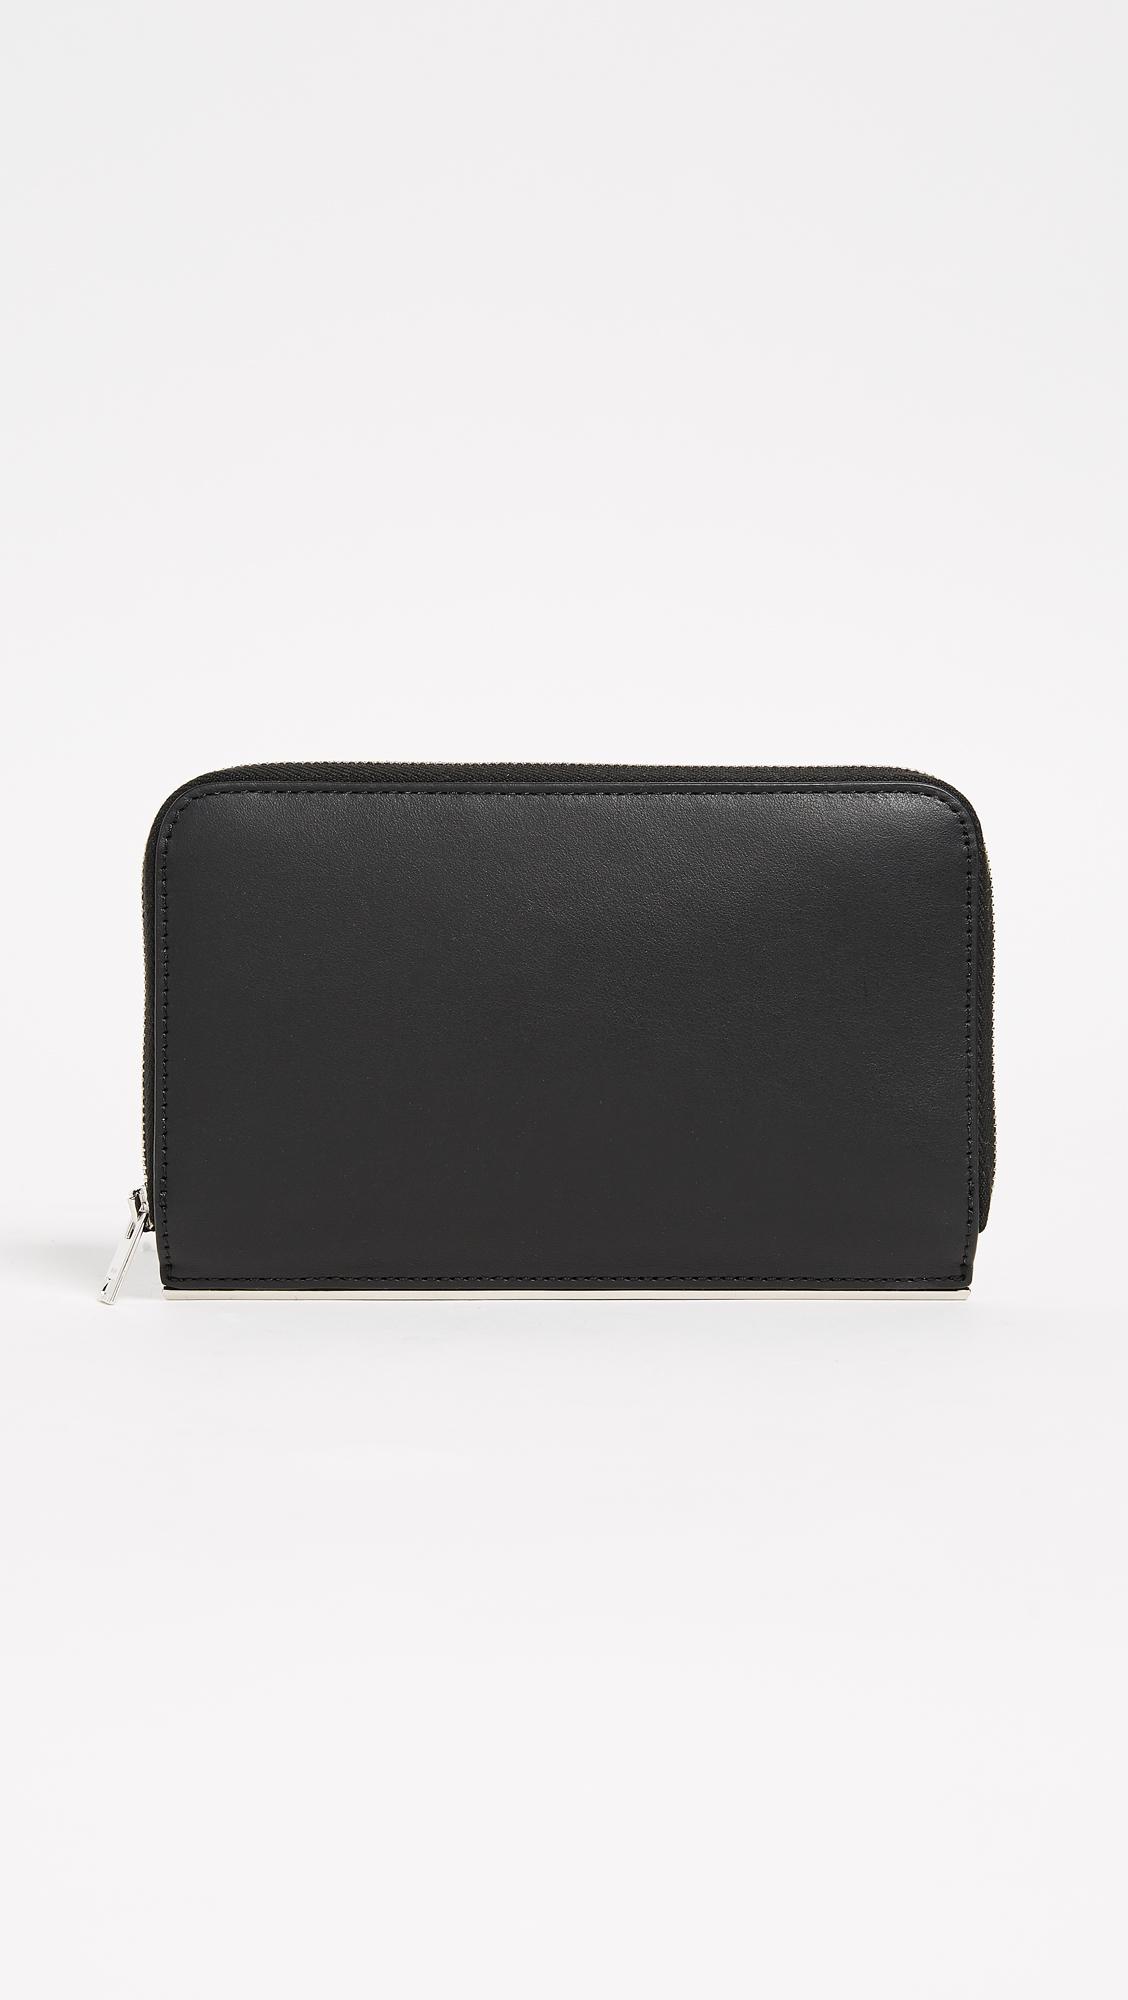 29b5b9a81 Alexander Wang Dime Continental Wallet with Zip | SHOPBOP